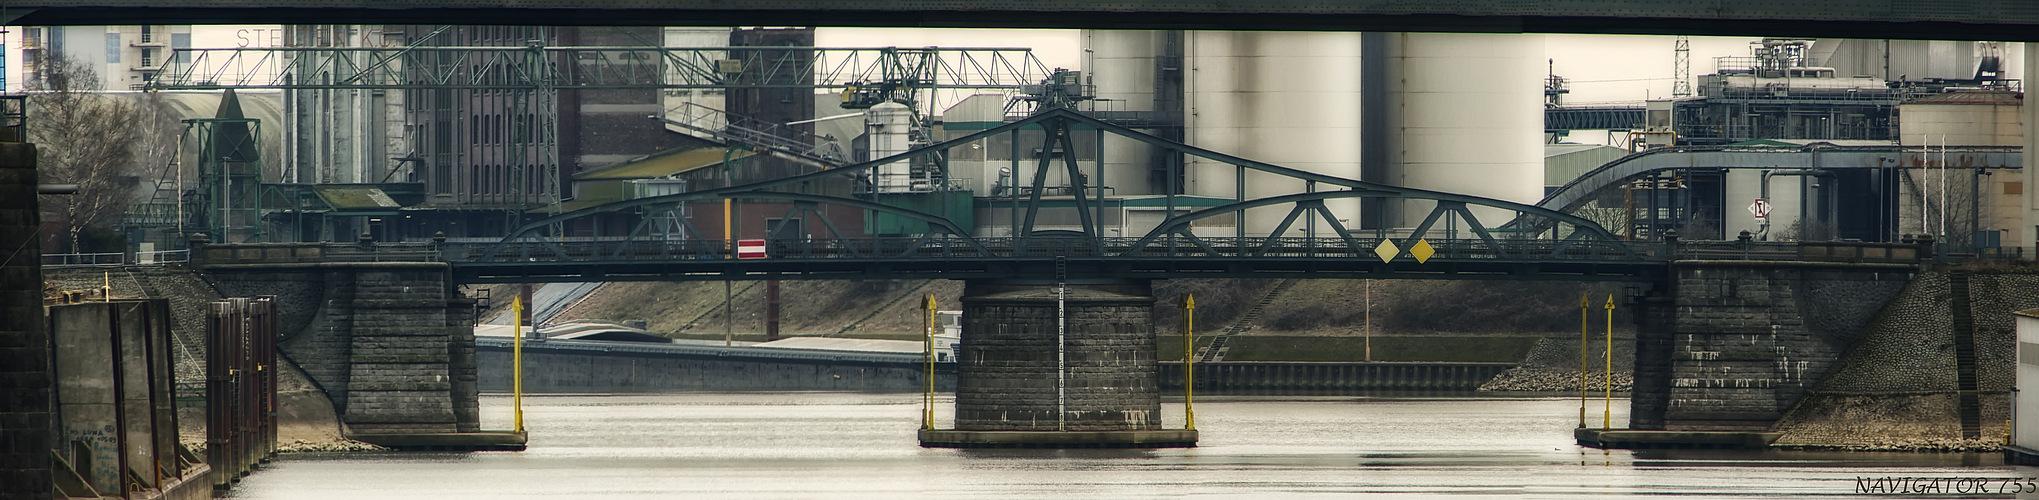 Drehbrücke im Rheinhafen Krefeld - Uerdingen